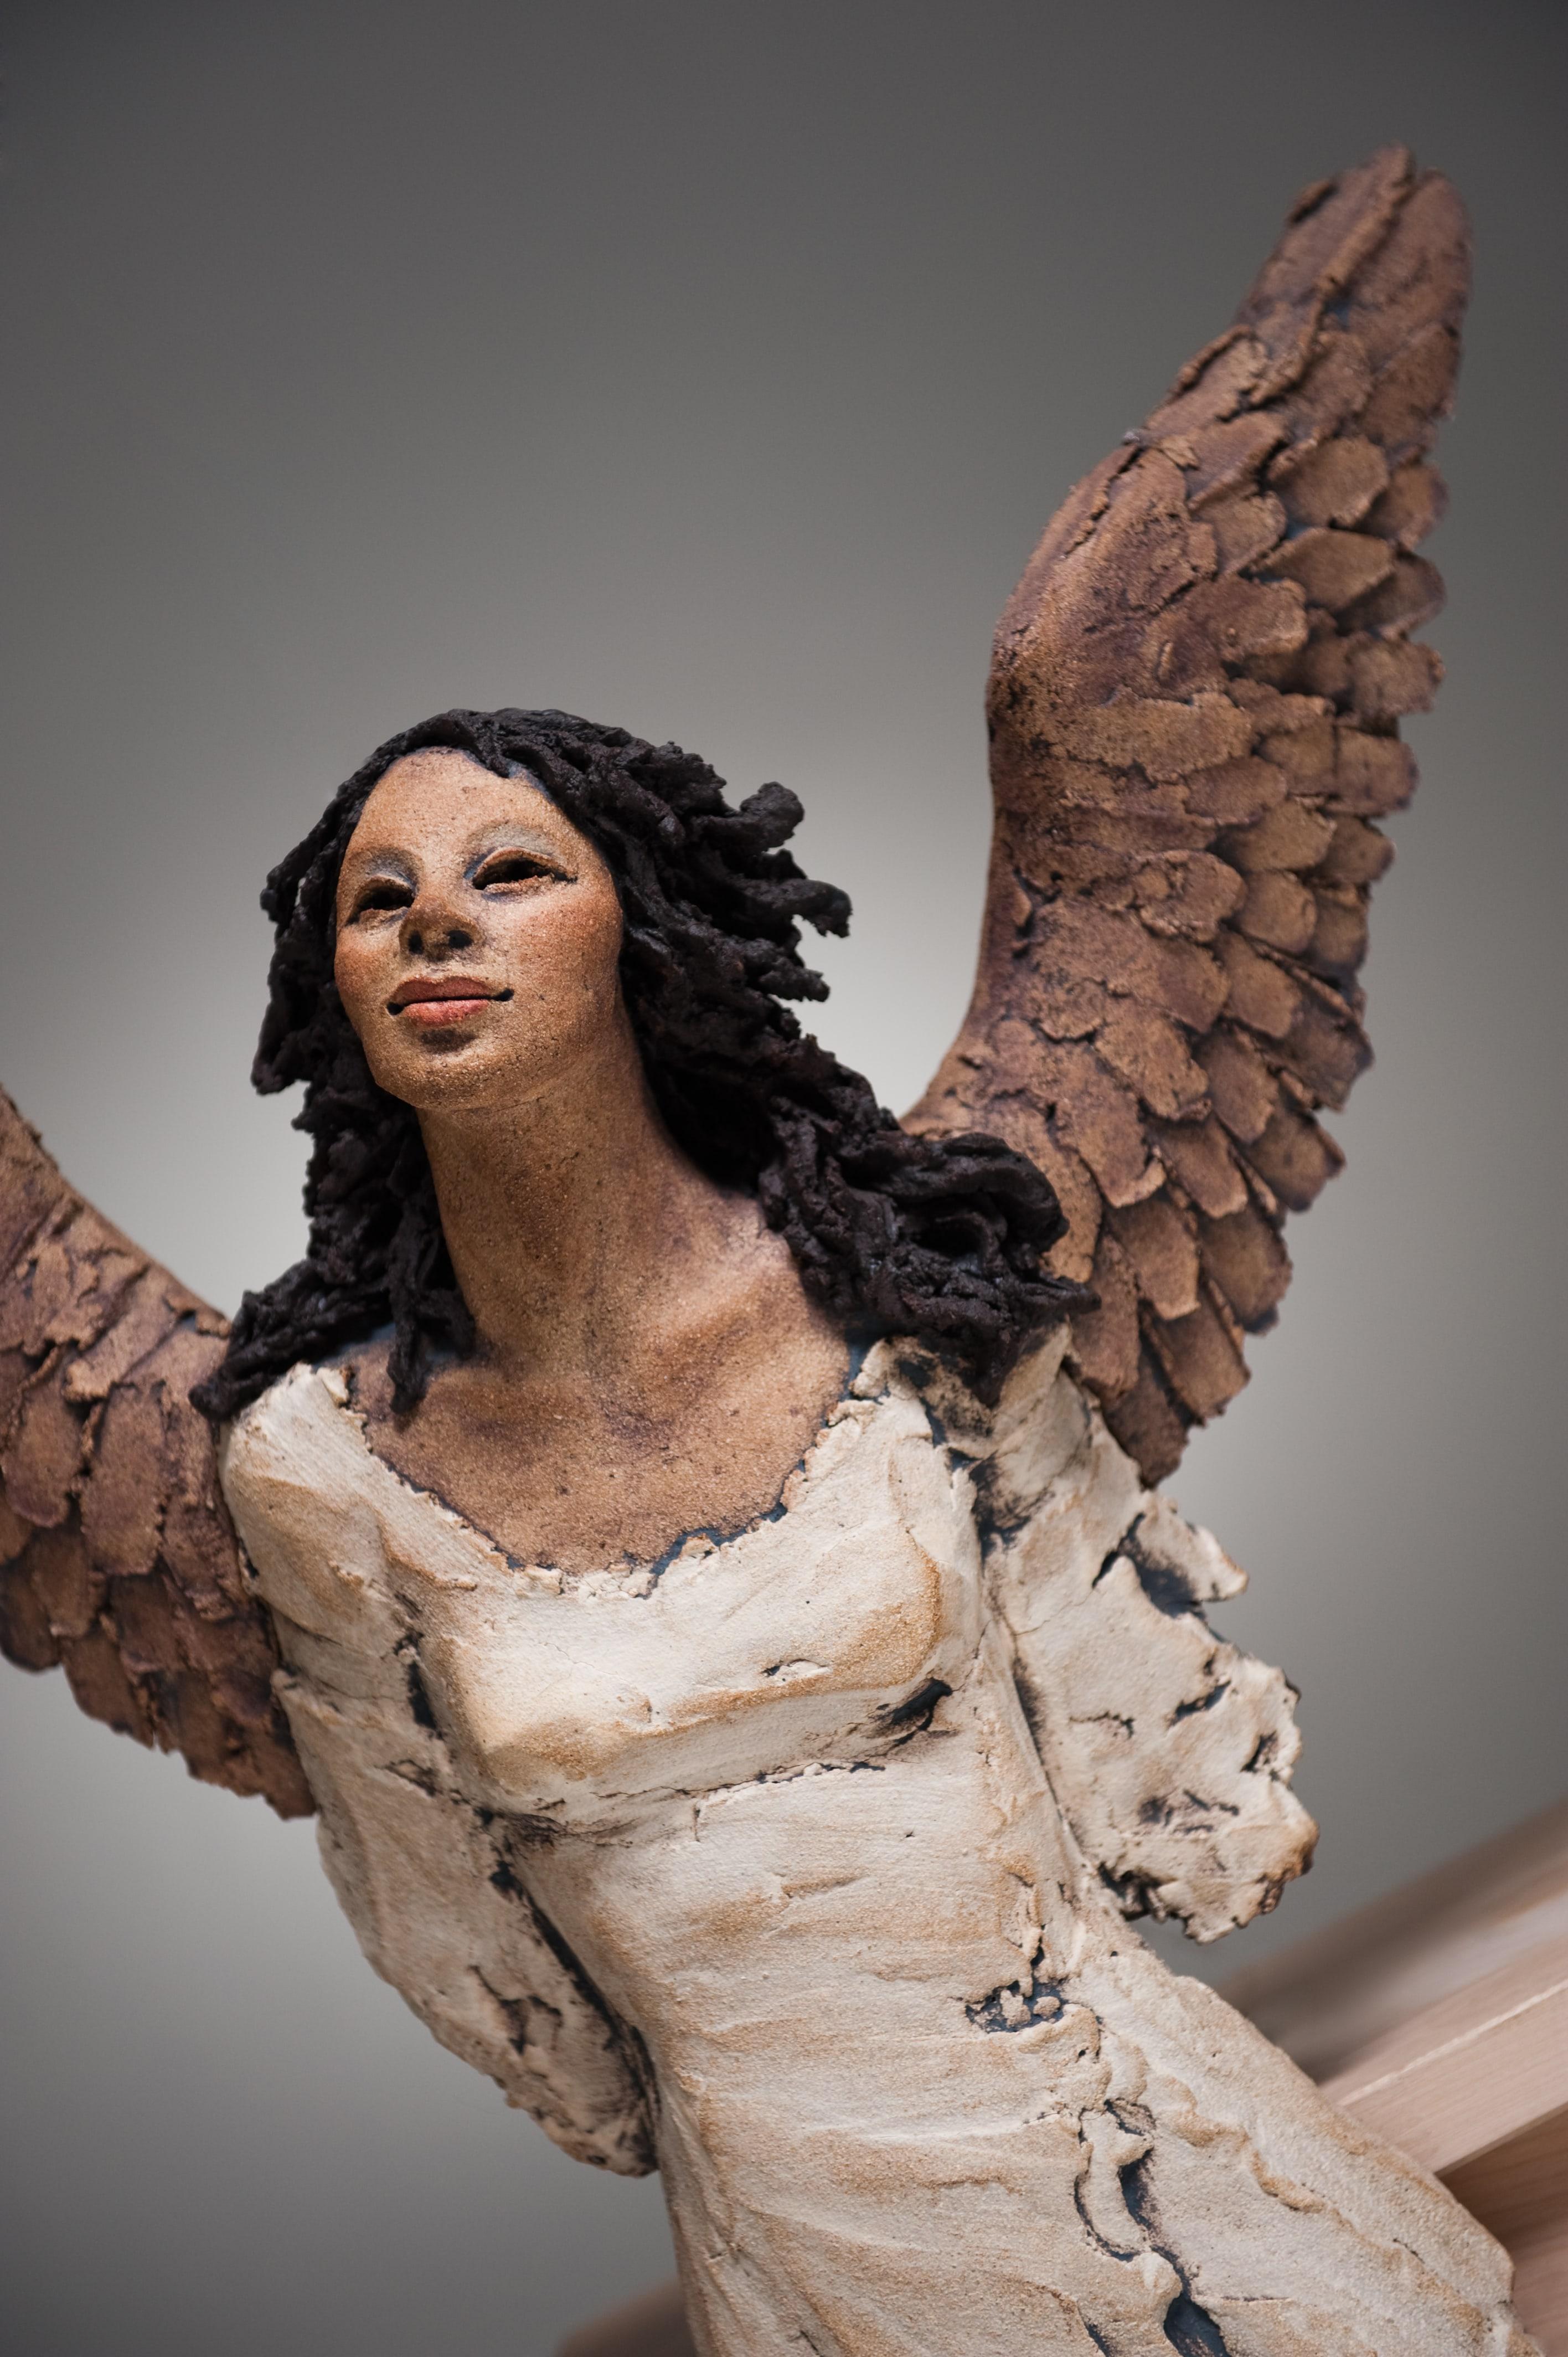 Håpets vingeslag, engel, veggengel, skulptur, keramikk, Ingun Dahlin